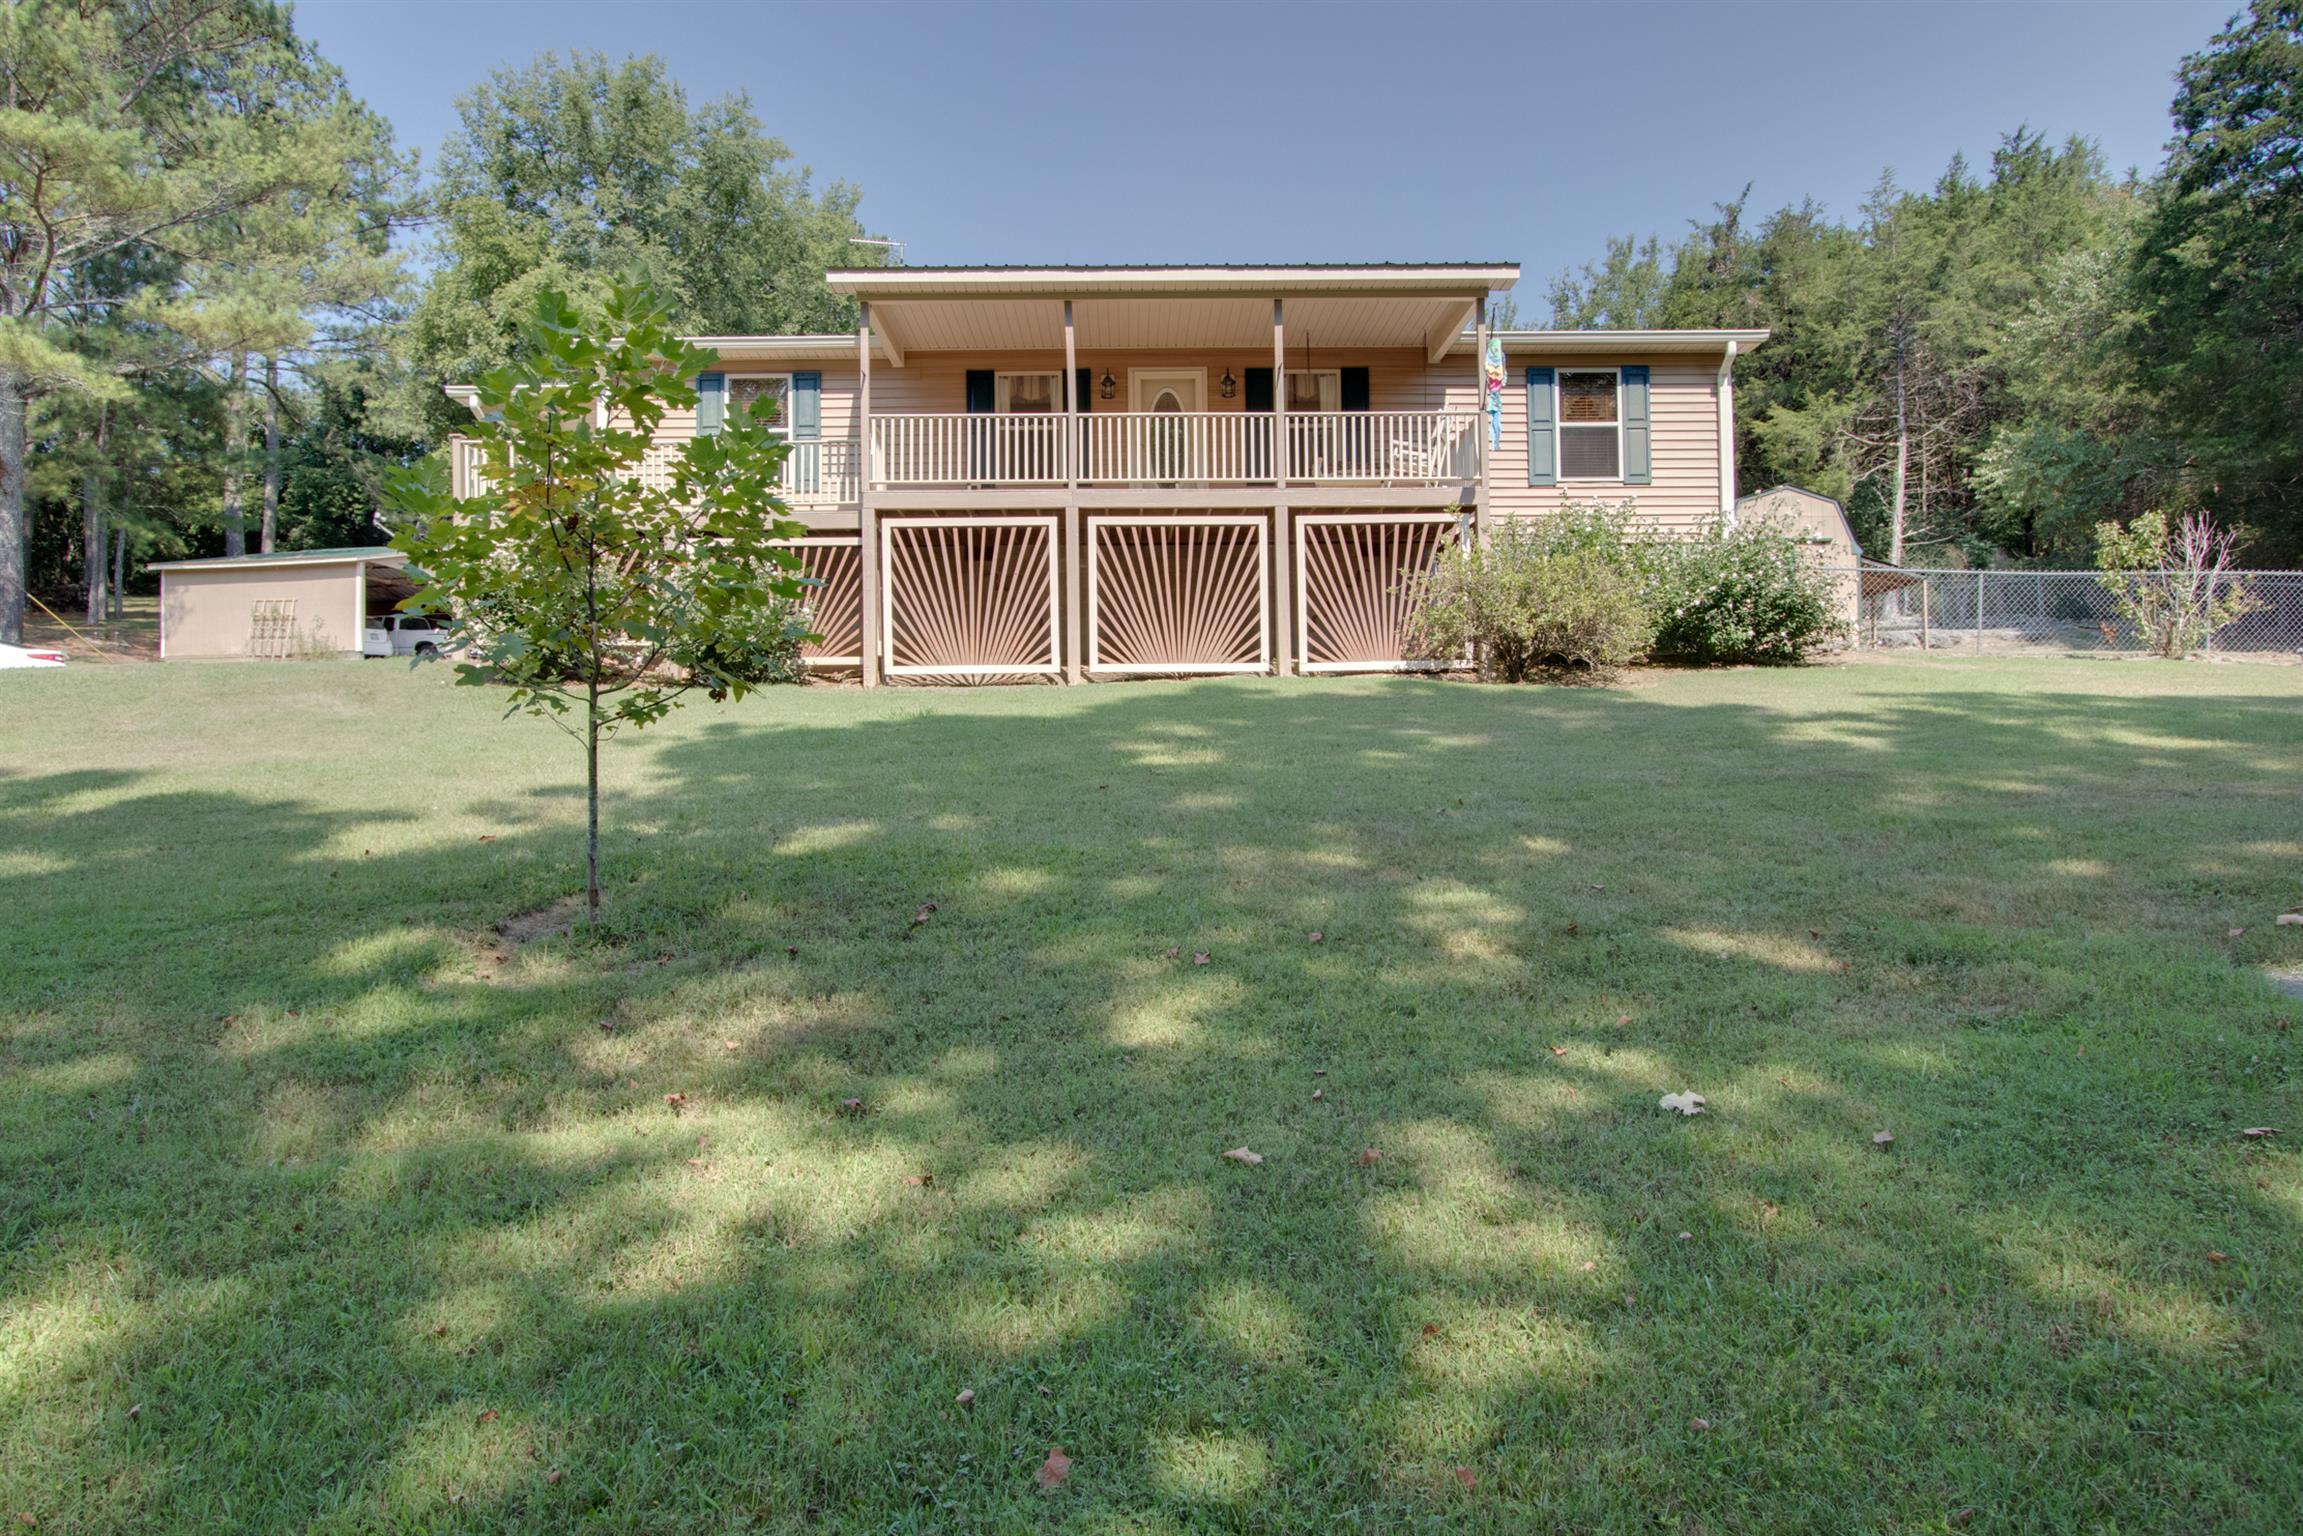 200 E Buffalo Rd, Pleasant Shade, TN 37145 - Pleasant Shade, TN real estate listing